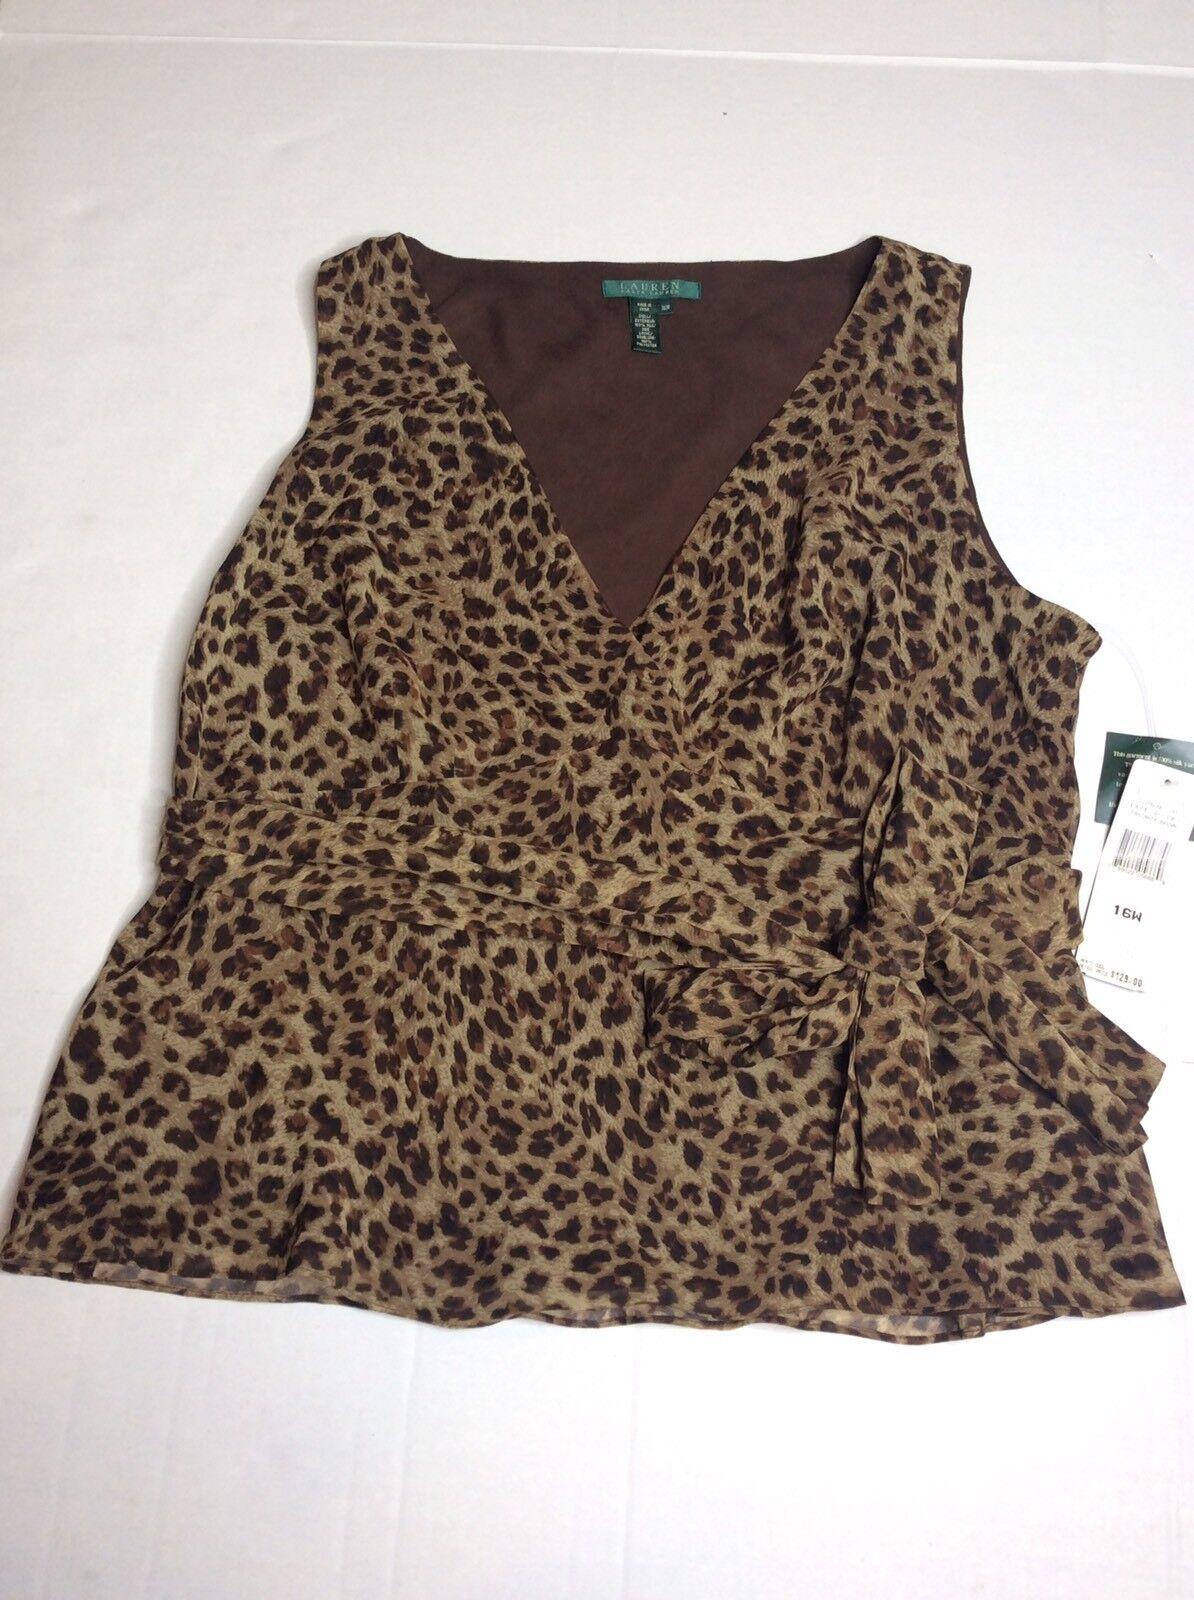 VTG Ralph Lauren Cape Grace Tanzania braun Animal Print Silk Blouse damen 16W